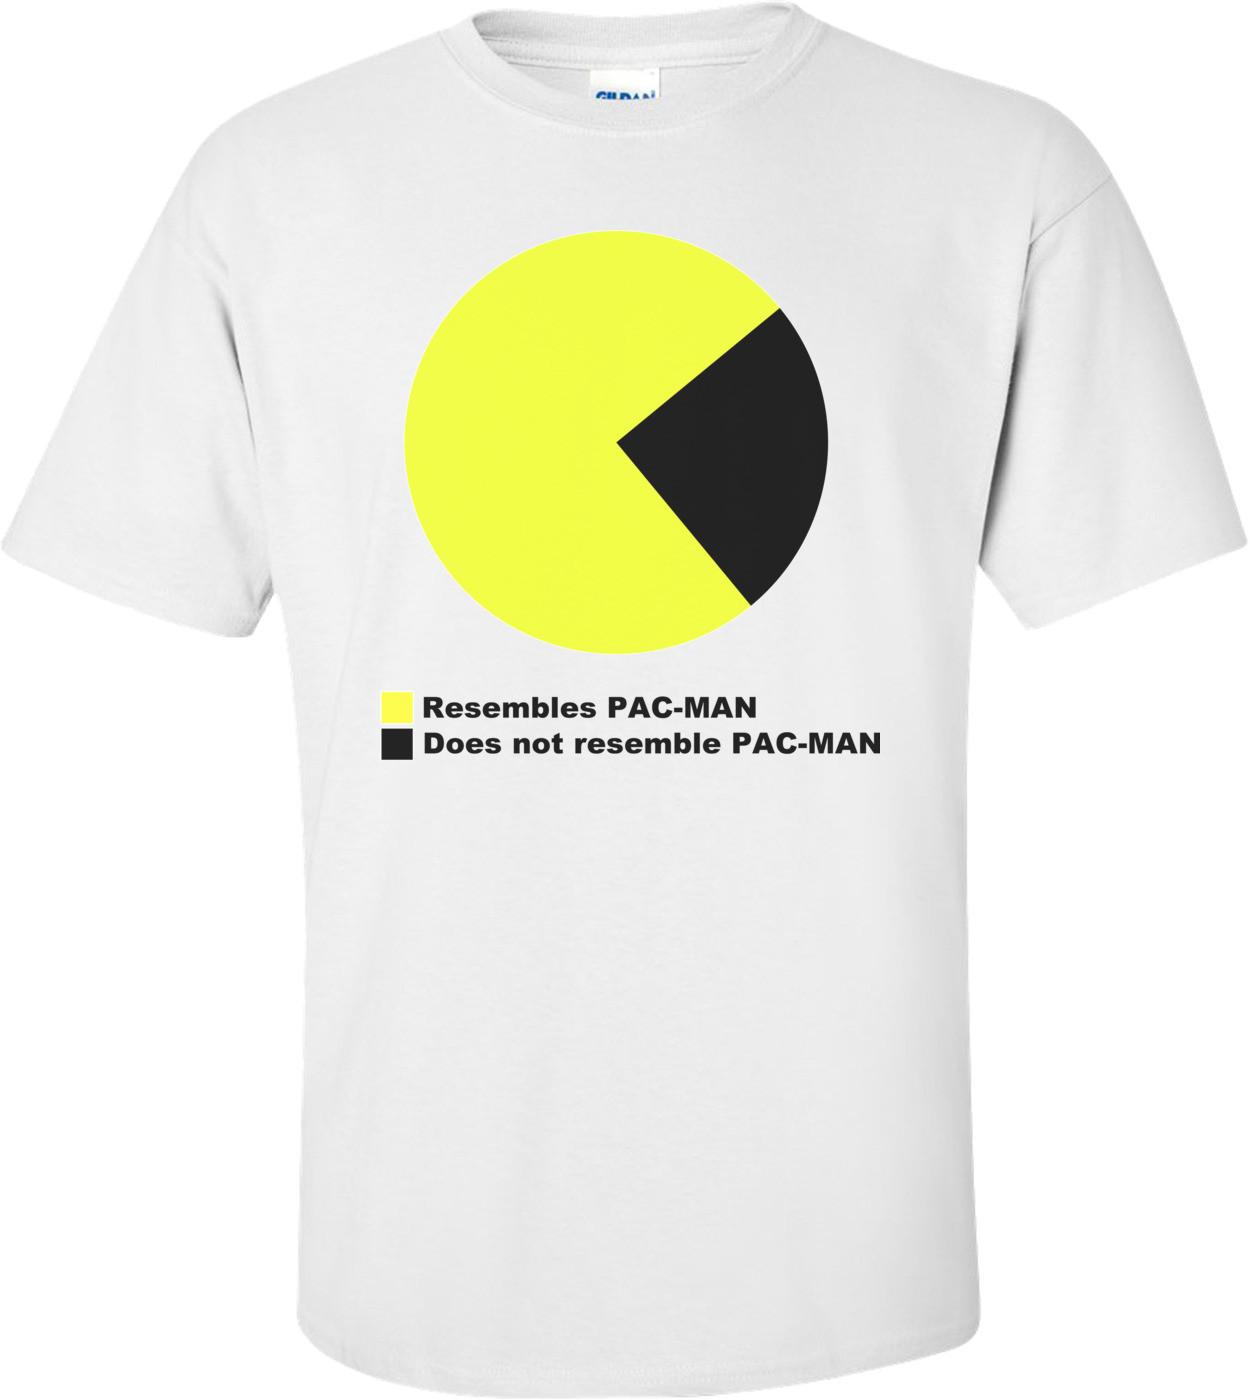 Pac-man Pie Chart T-shirt - Resembles Pac-man T-Shirt